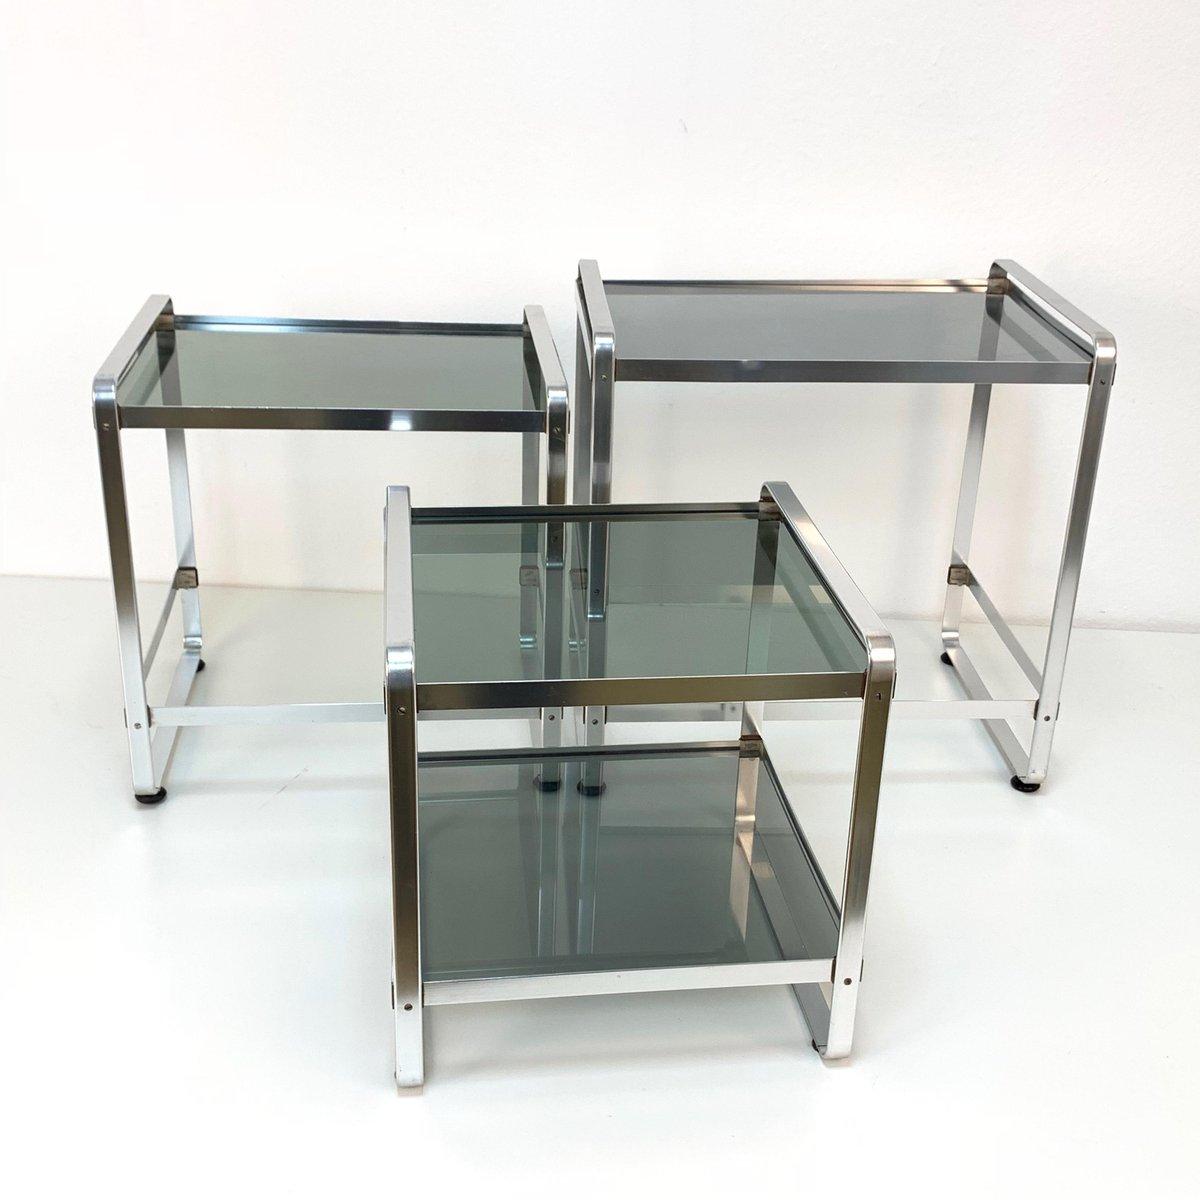 Tables gigognes en aluminium et en verre fum italie 1970s en vente sur pamono for Tables gigognes verre